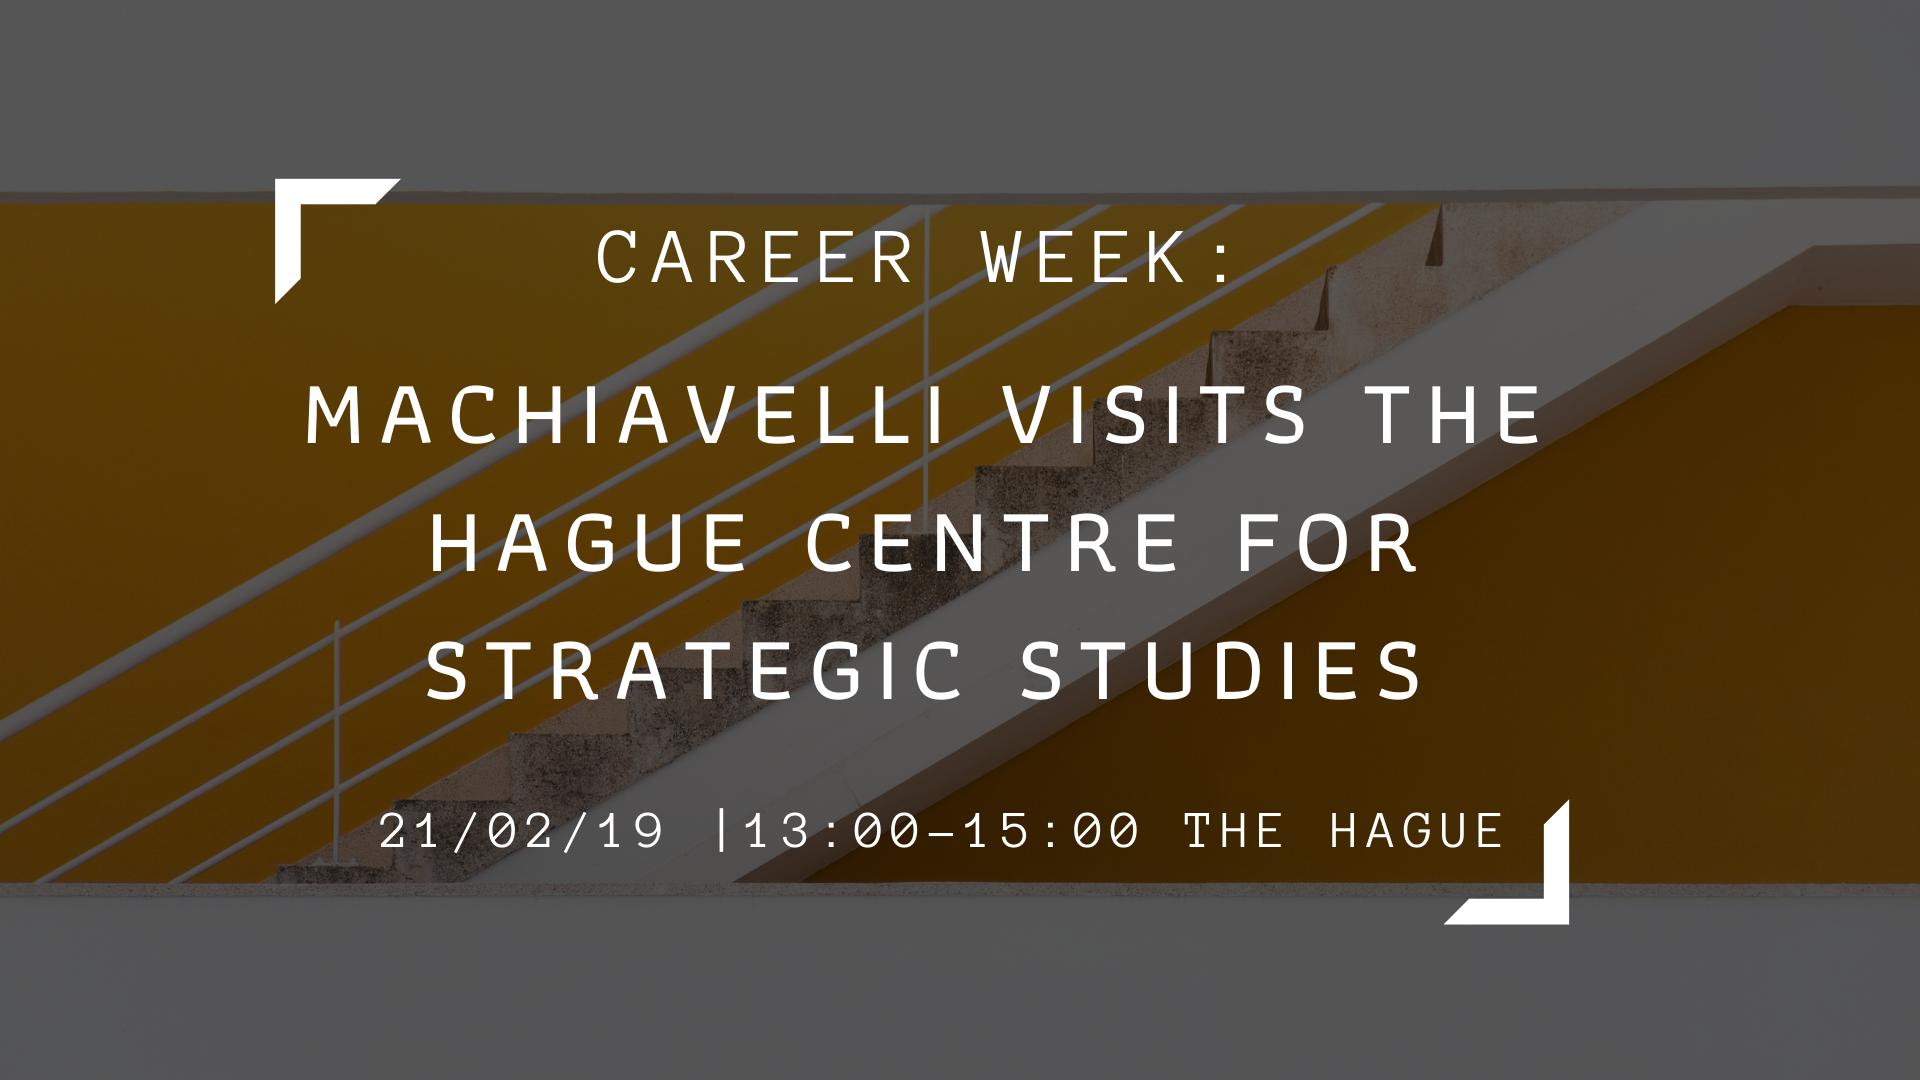 Career Week: Machiavelli Visits The Hague Centre for Strategic Studies